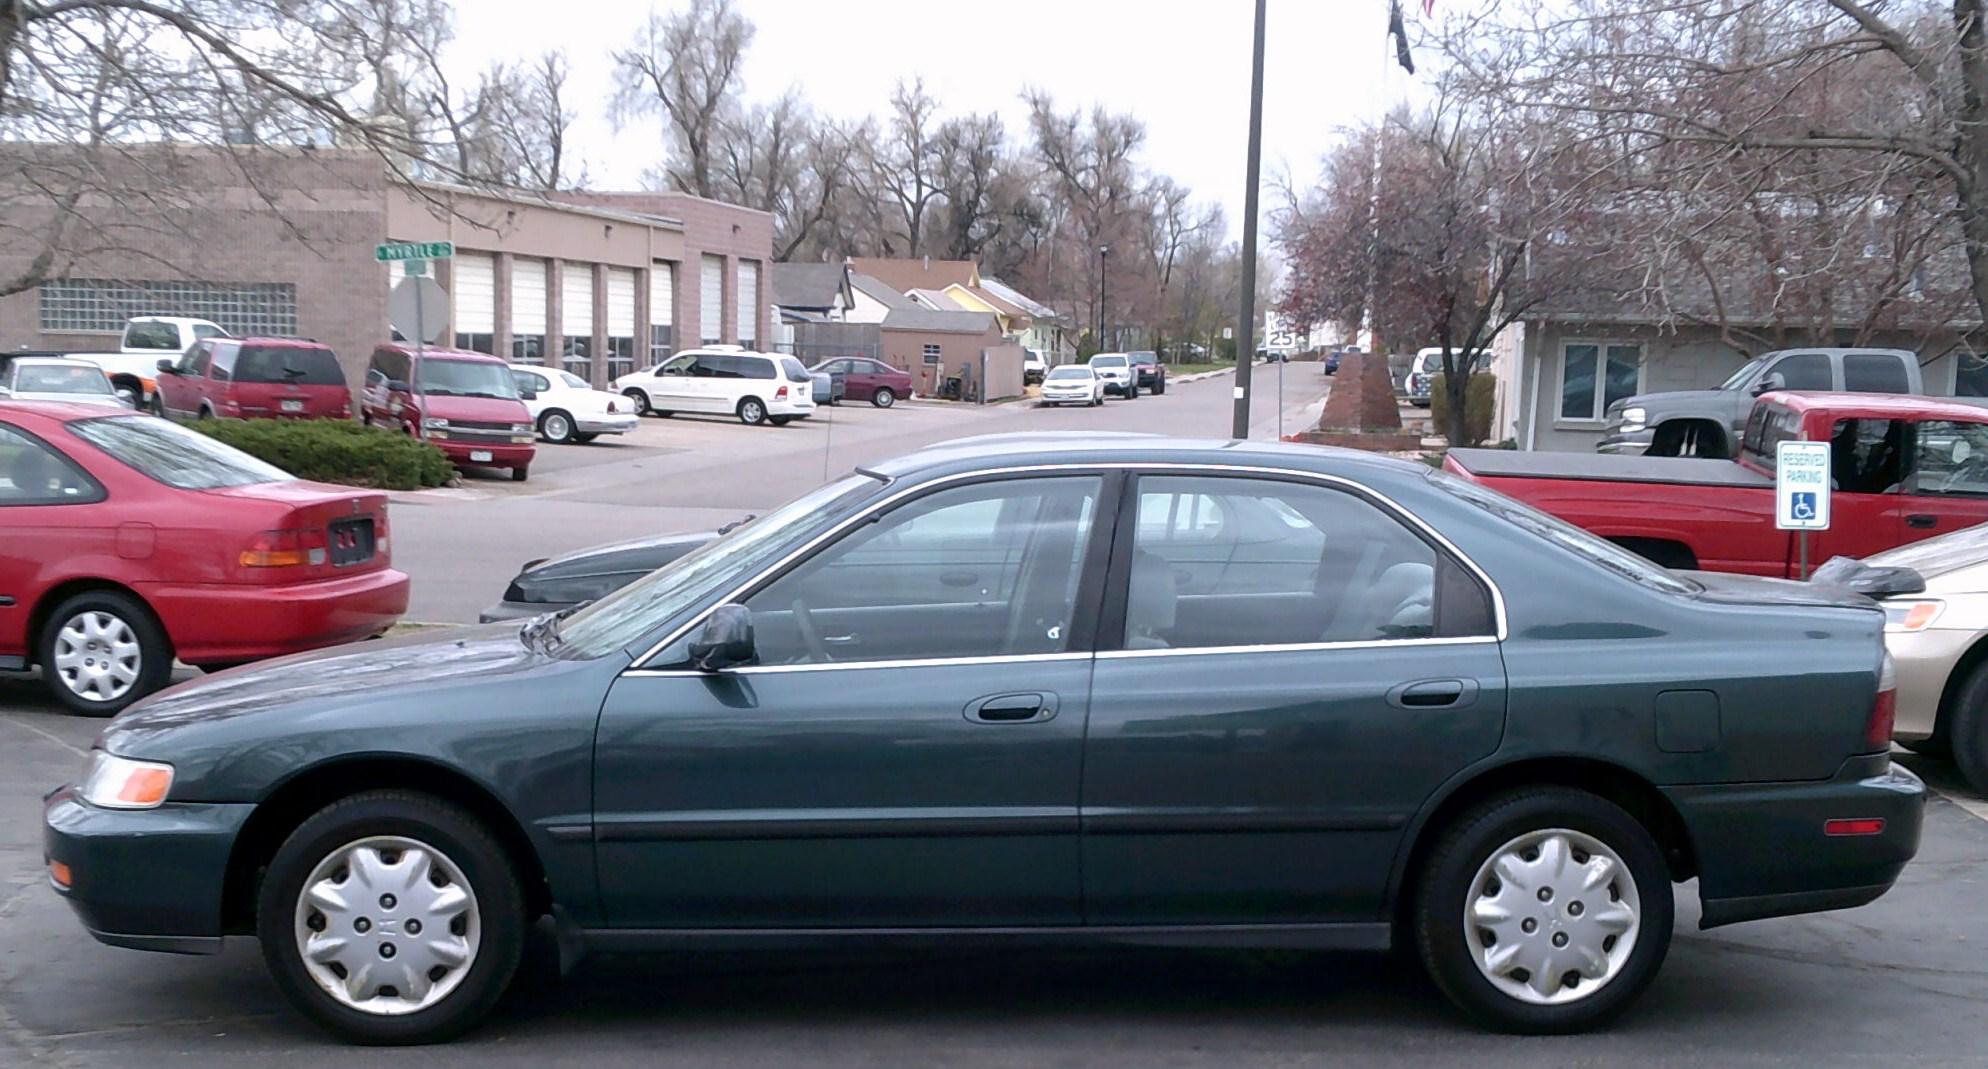 96 Accord Lx Driver Side View Mr Auto